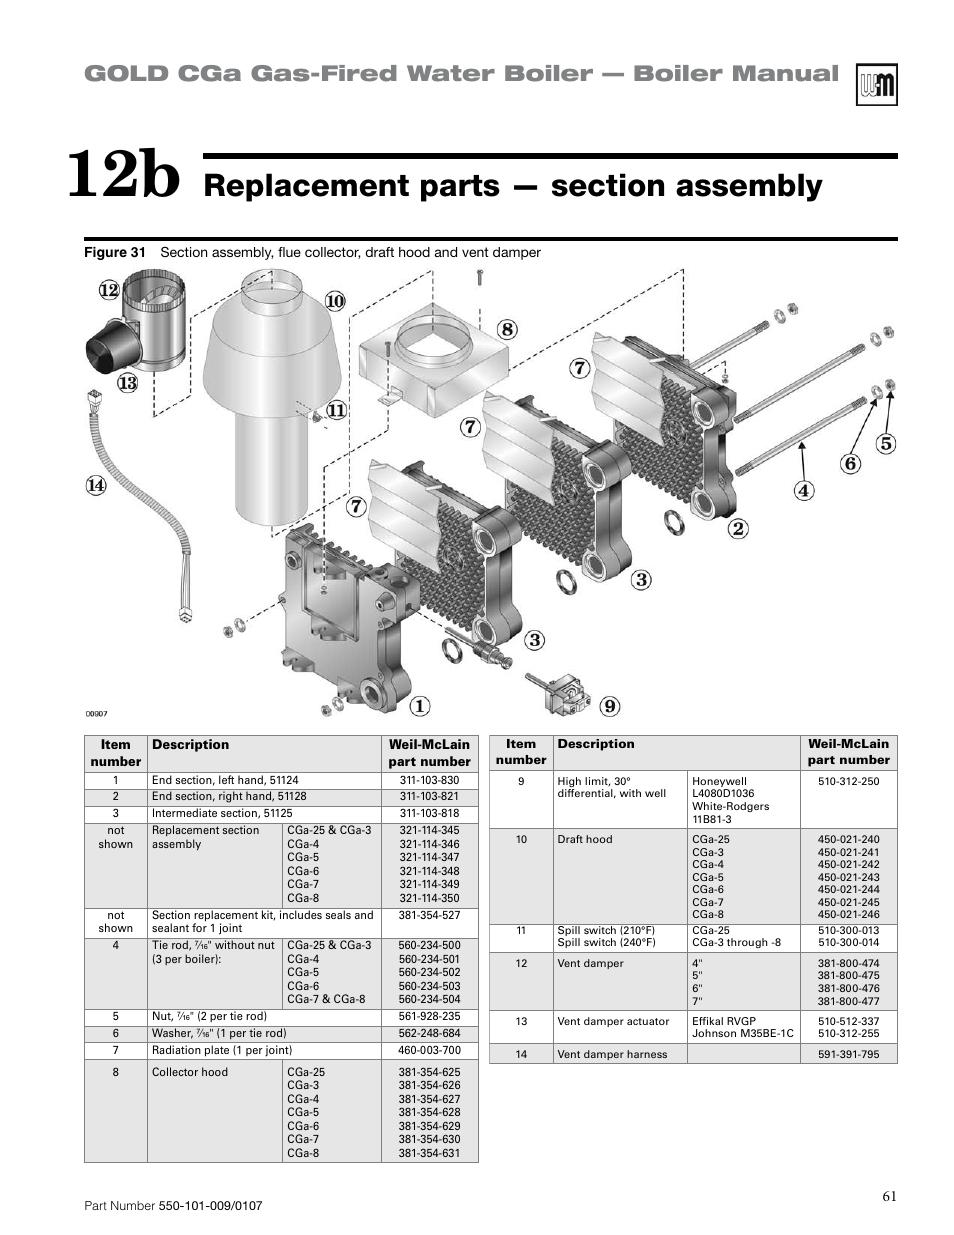 Gold cga gas-fired water boiler — boiler manual   Weil-McLain Gold ...